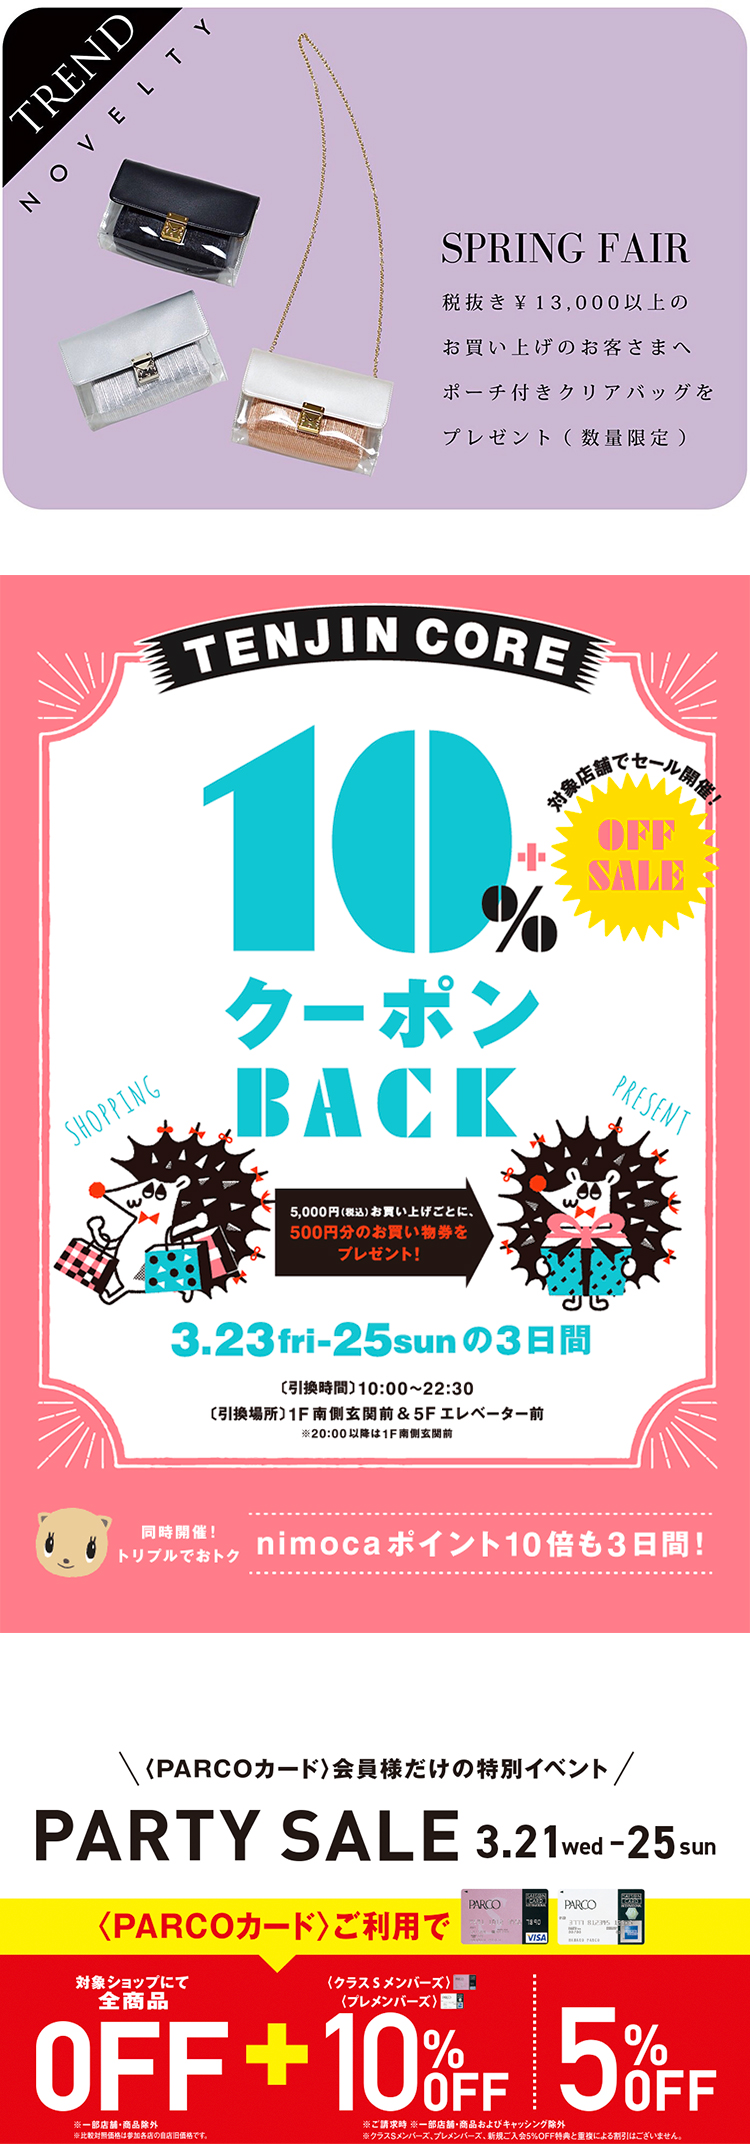 Roomy's天神コア店、SPIRALGIRL/Roomy's熊本PARCO店 3/23 SPRING FAIRスタート!